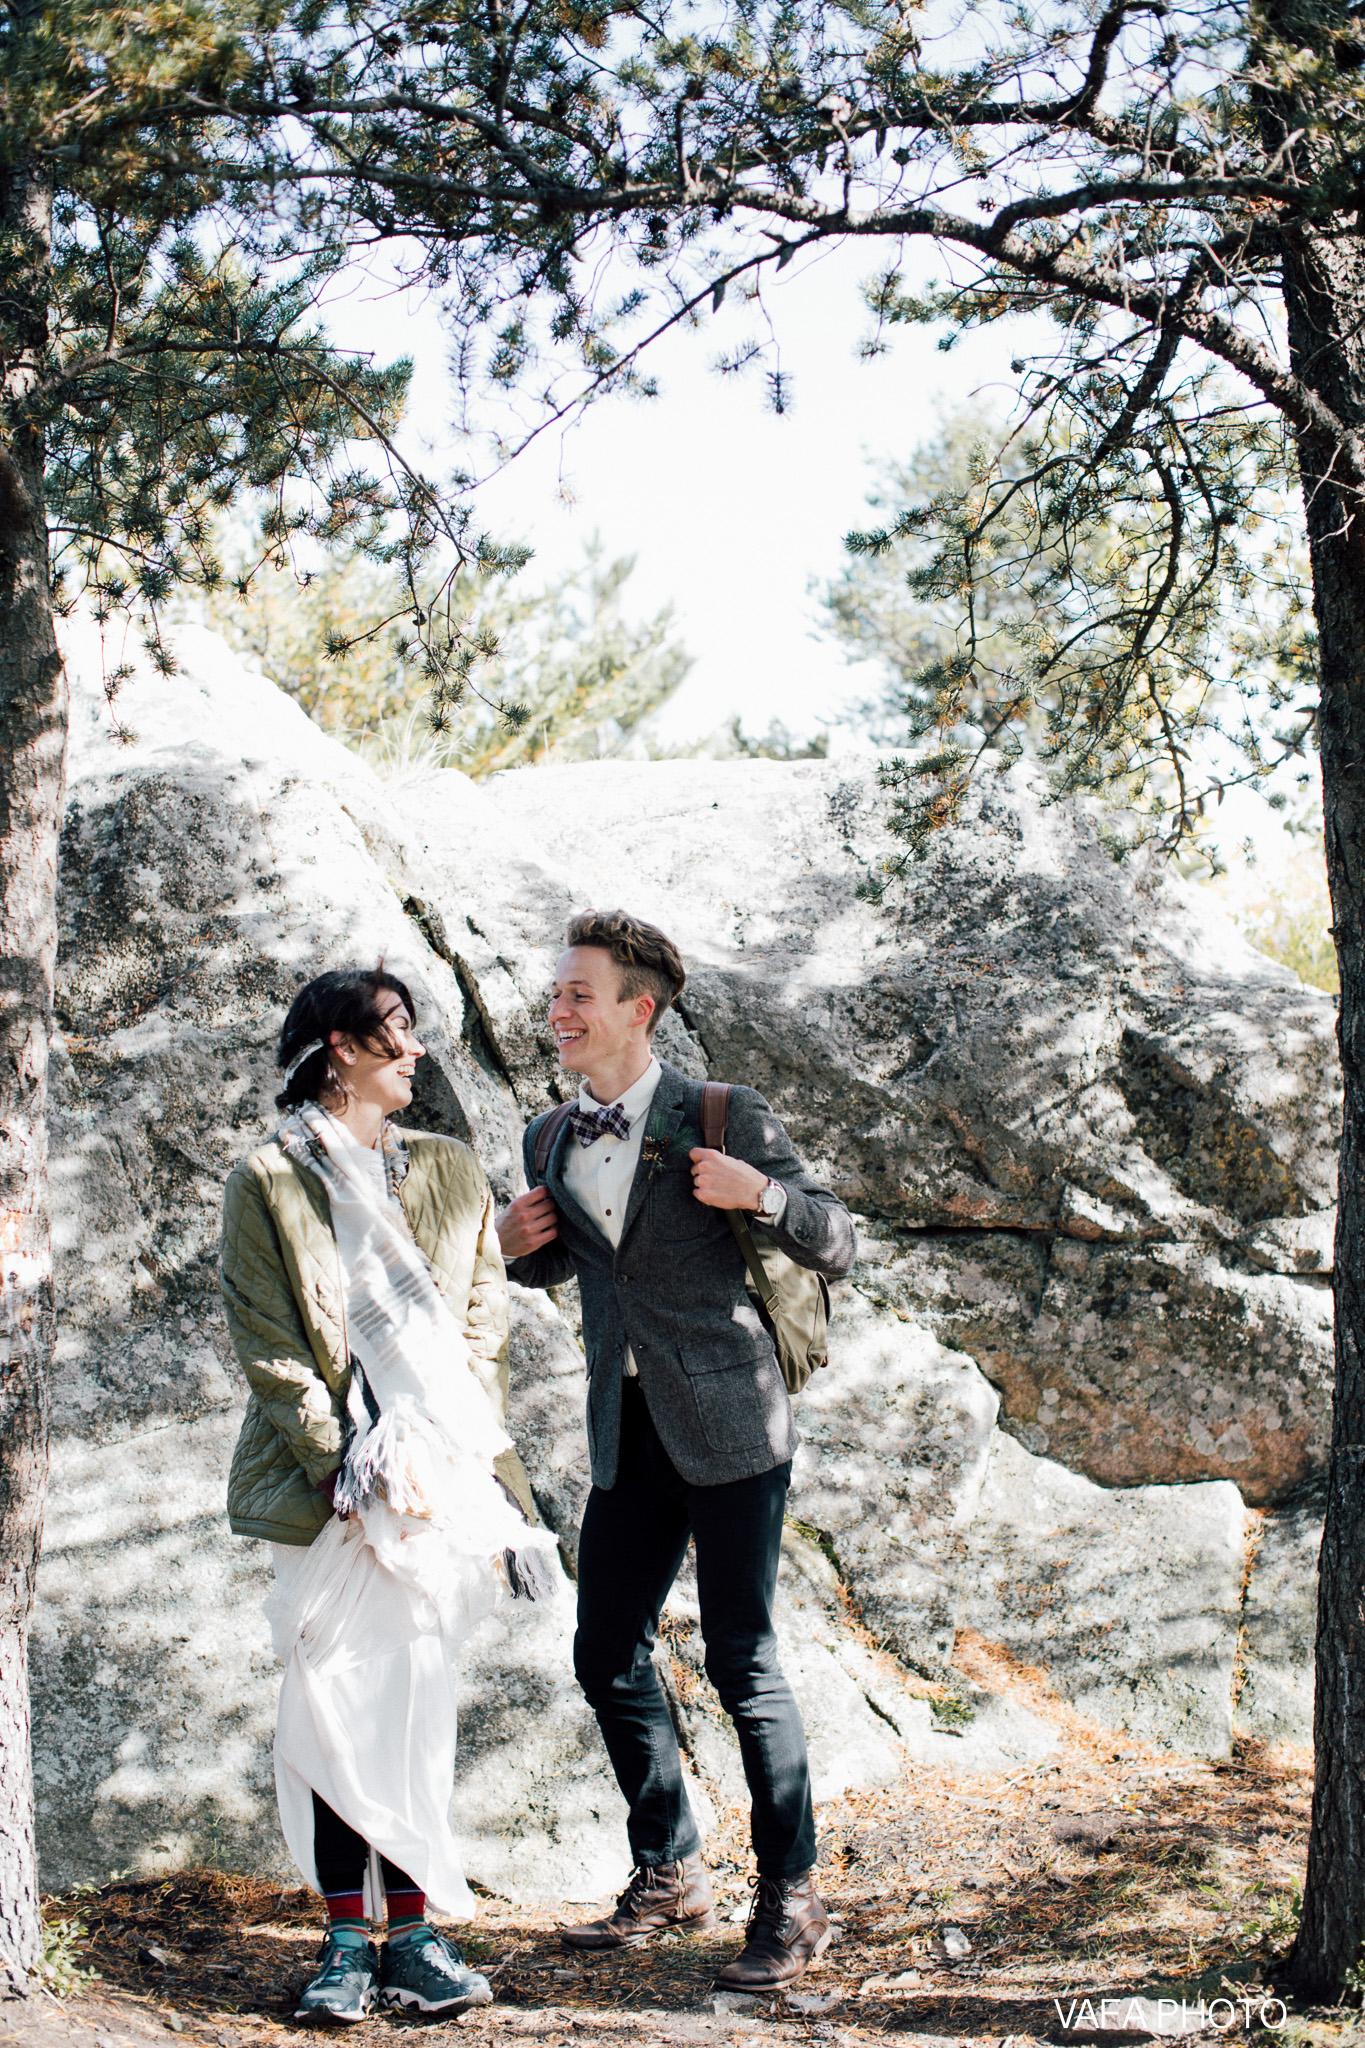 Hogback-Mountain-Wedding-Chelsea-Josh-Vafa-Photo-454.jpg